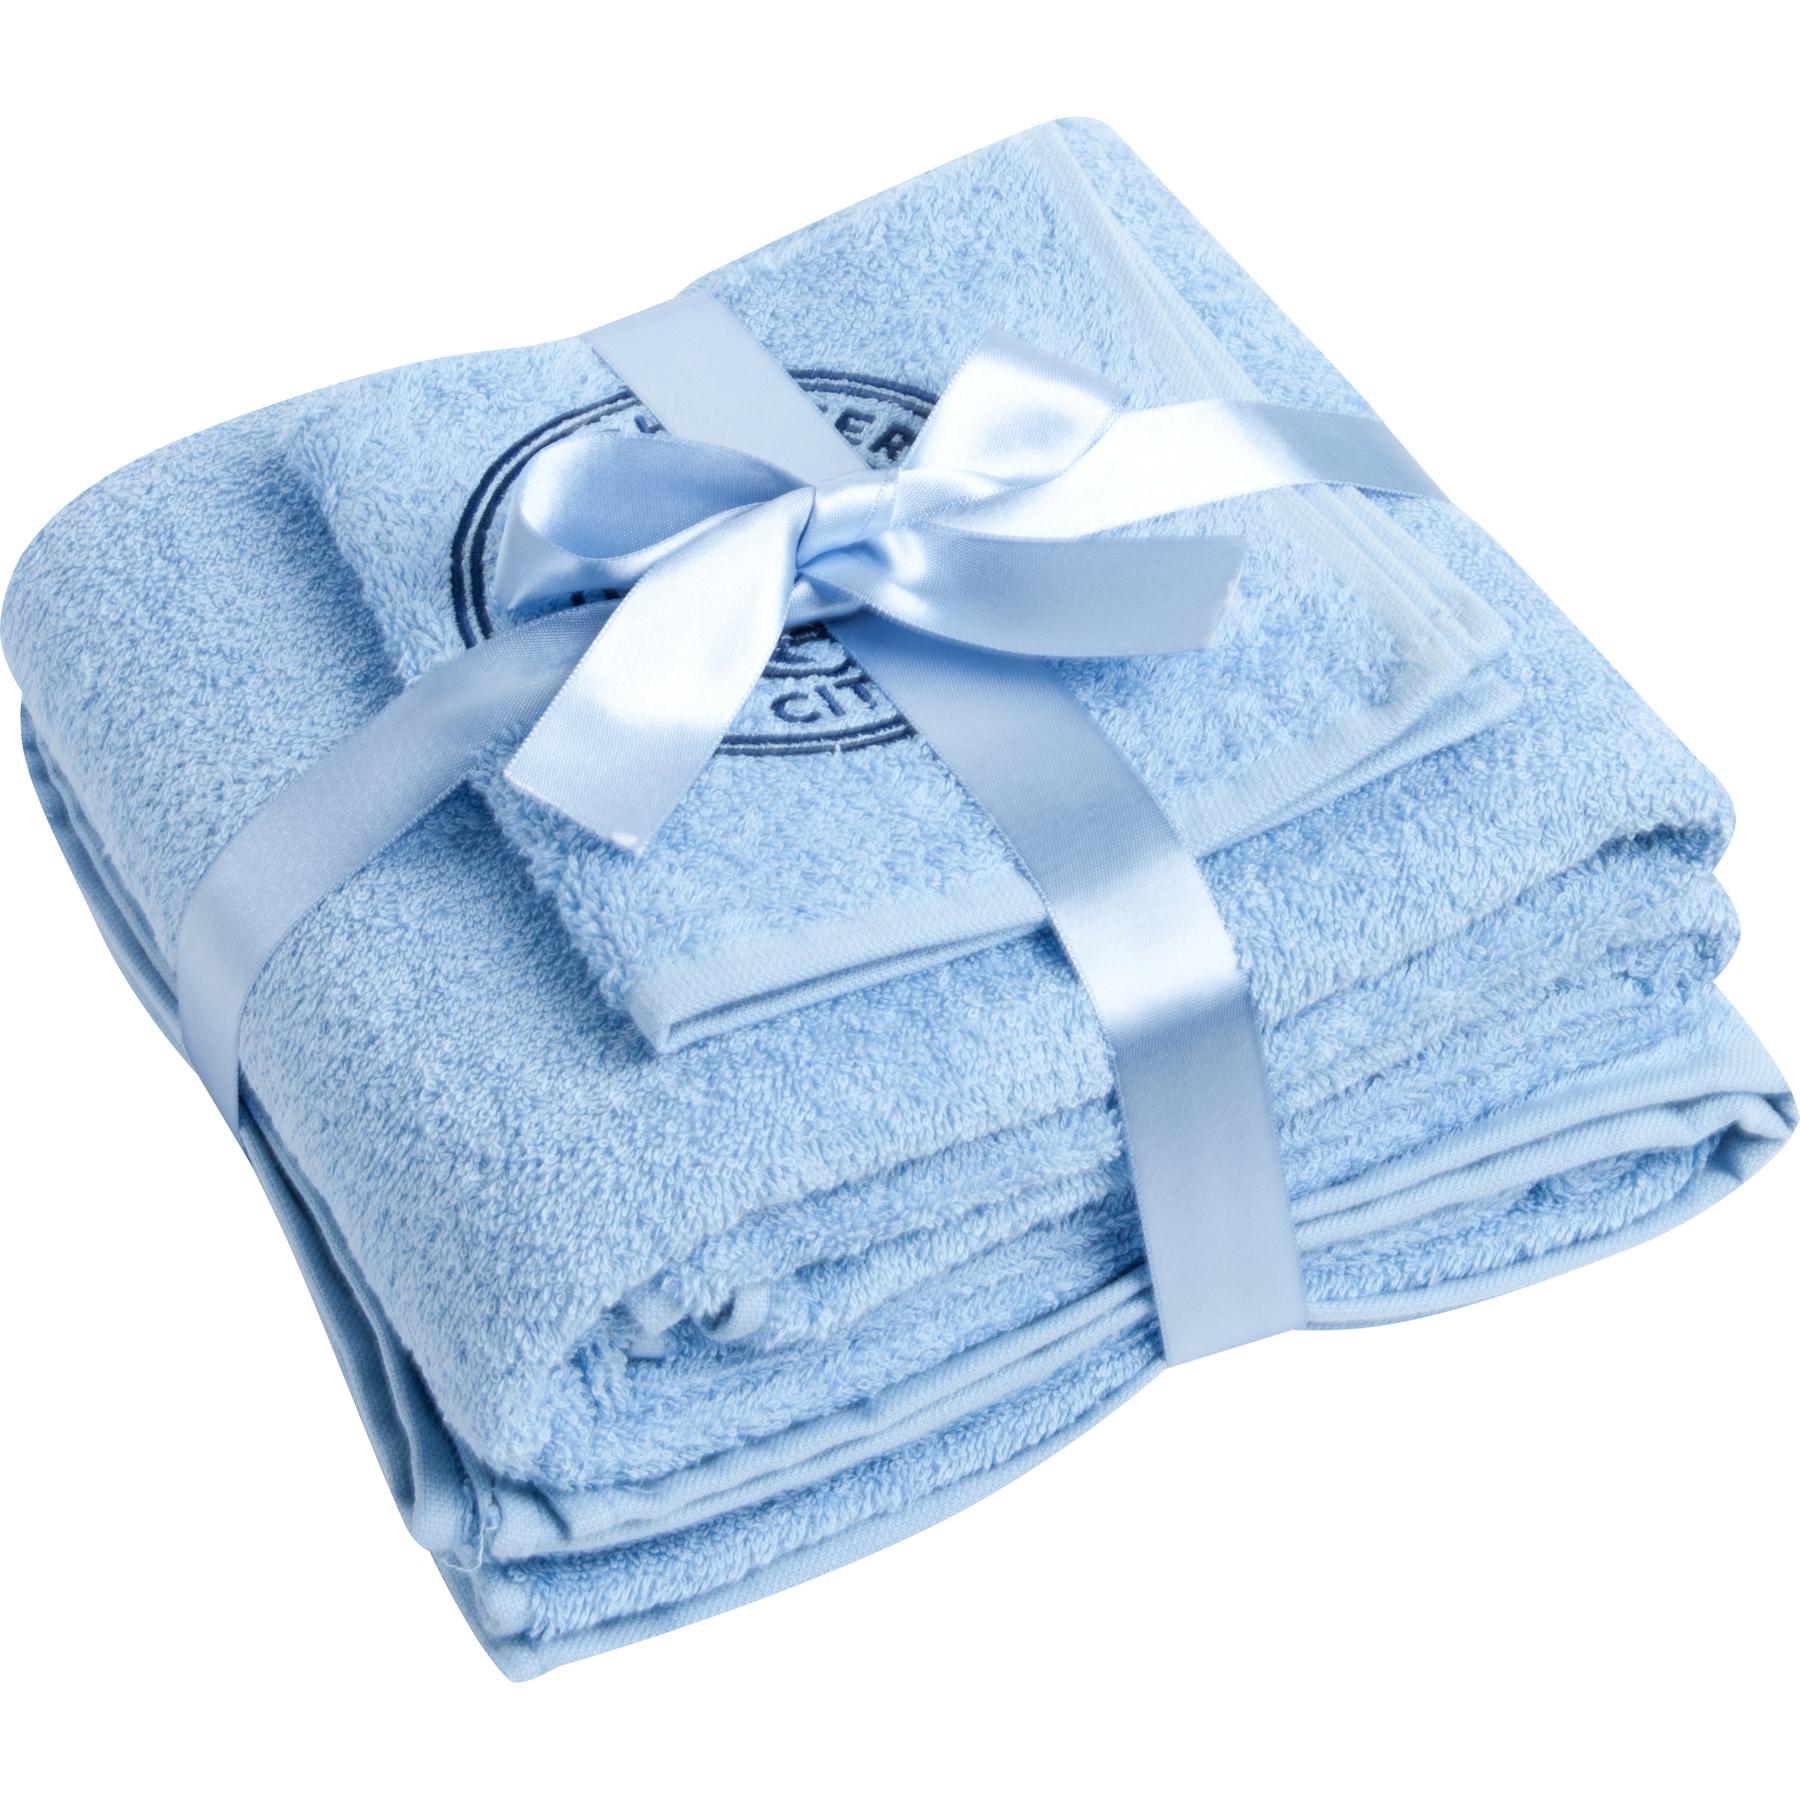 Manchester City Jaquard Towel Set